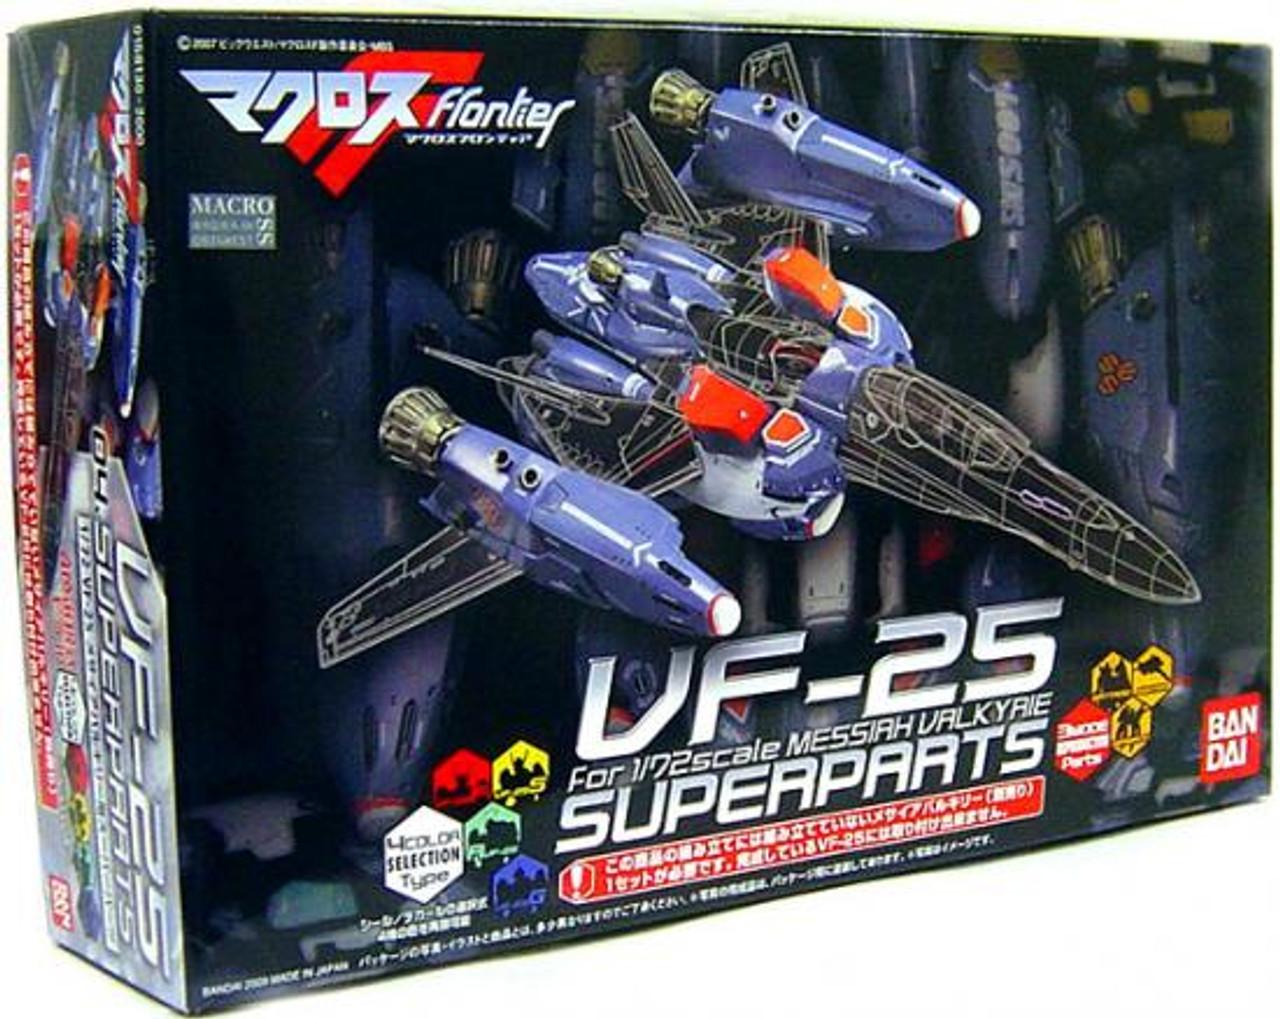 Macross Super Parts for Transformable Model VF-25 Messiah Valkyrie Model Kit